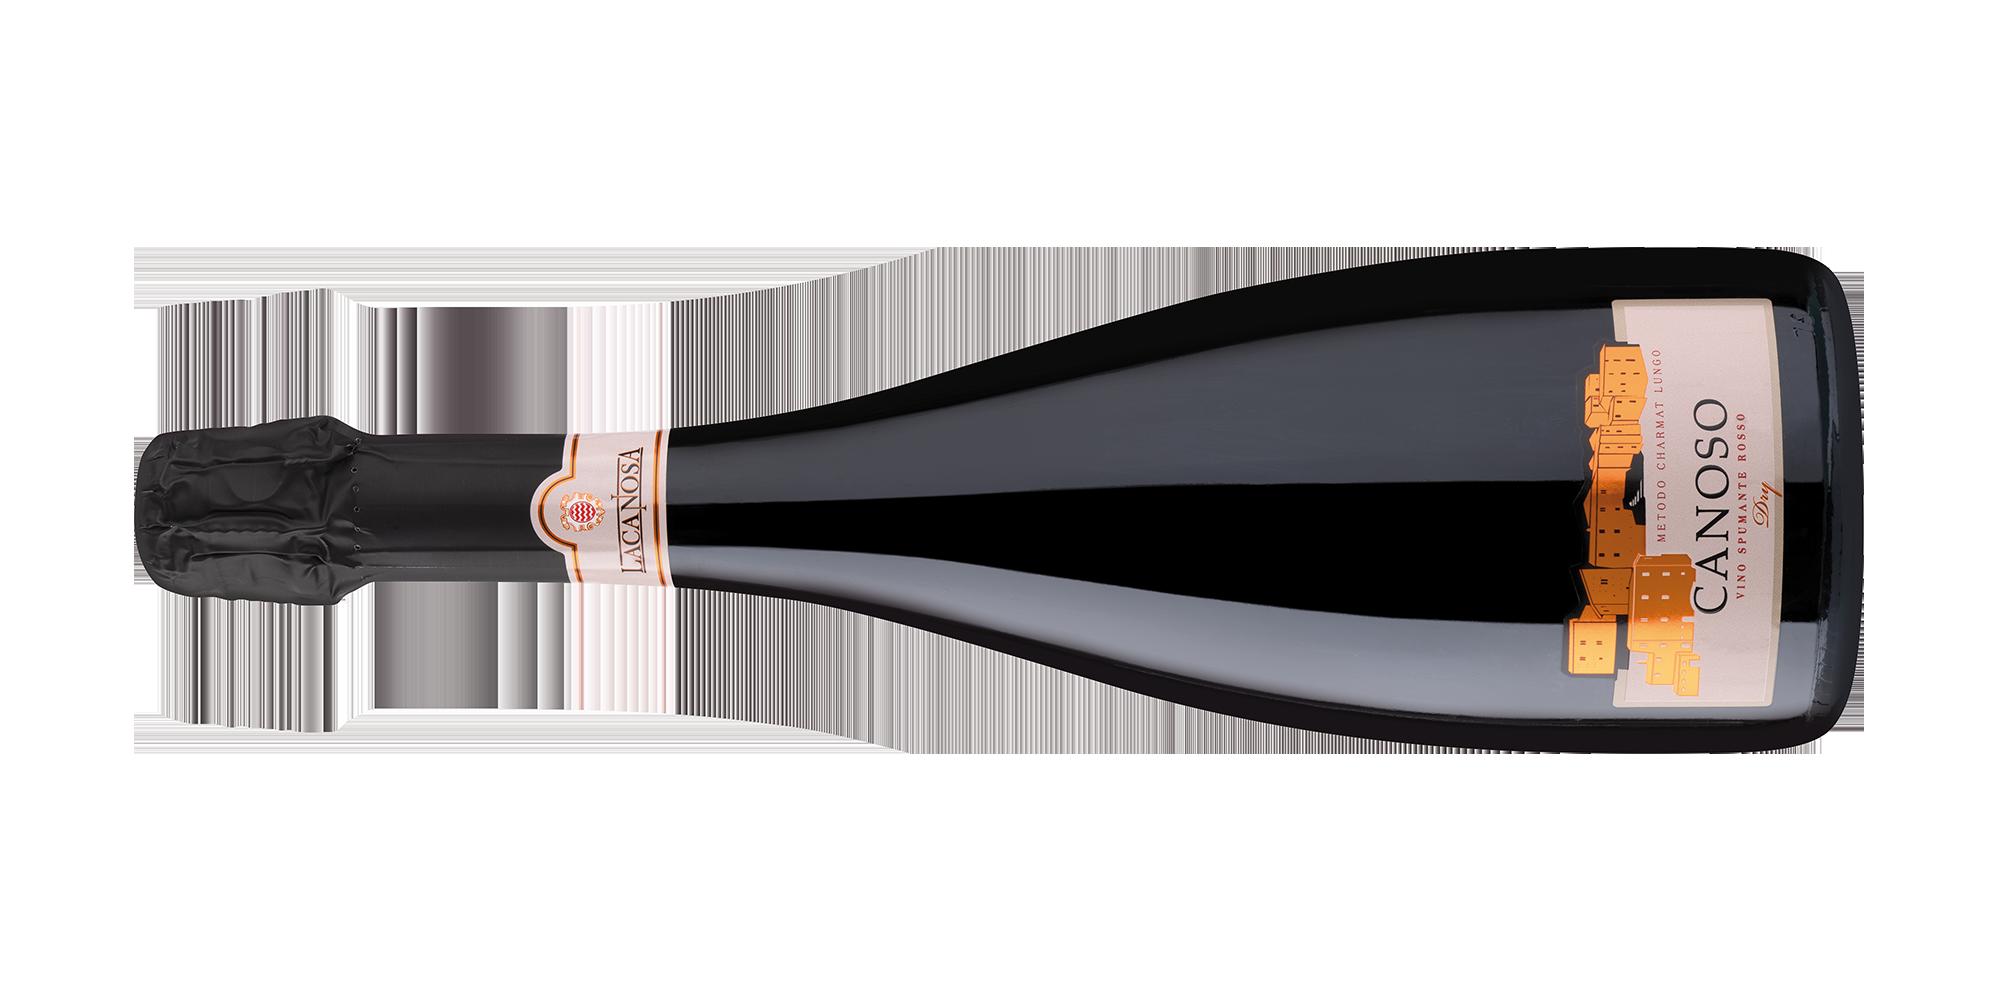 Canoso - Vino Spumante Rosso Sangiovese Dry